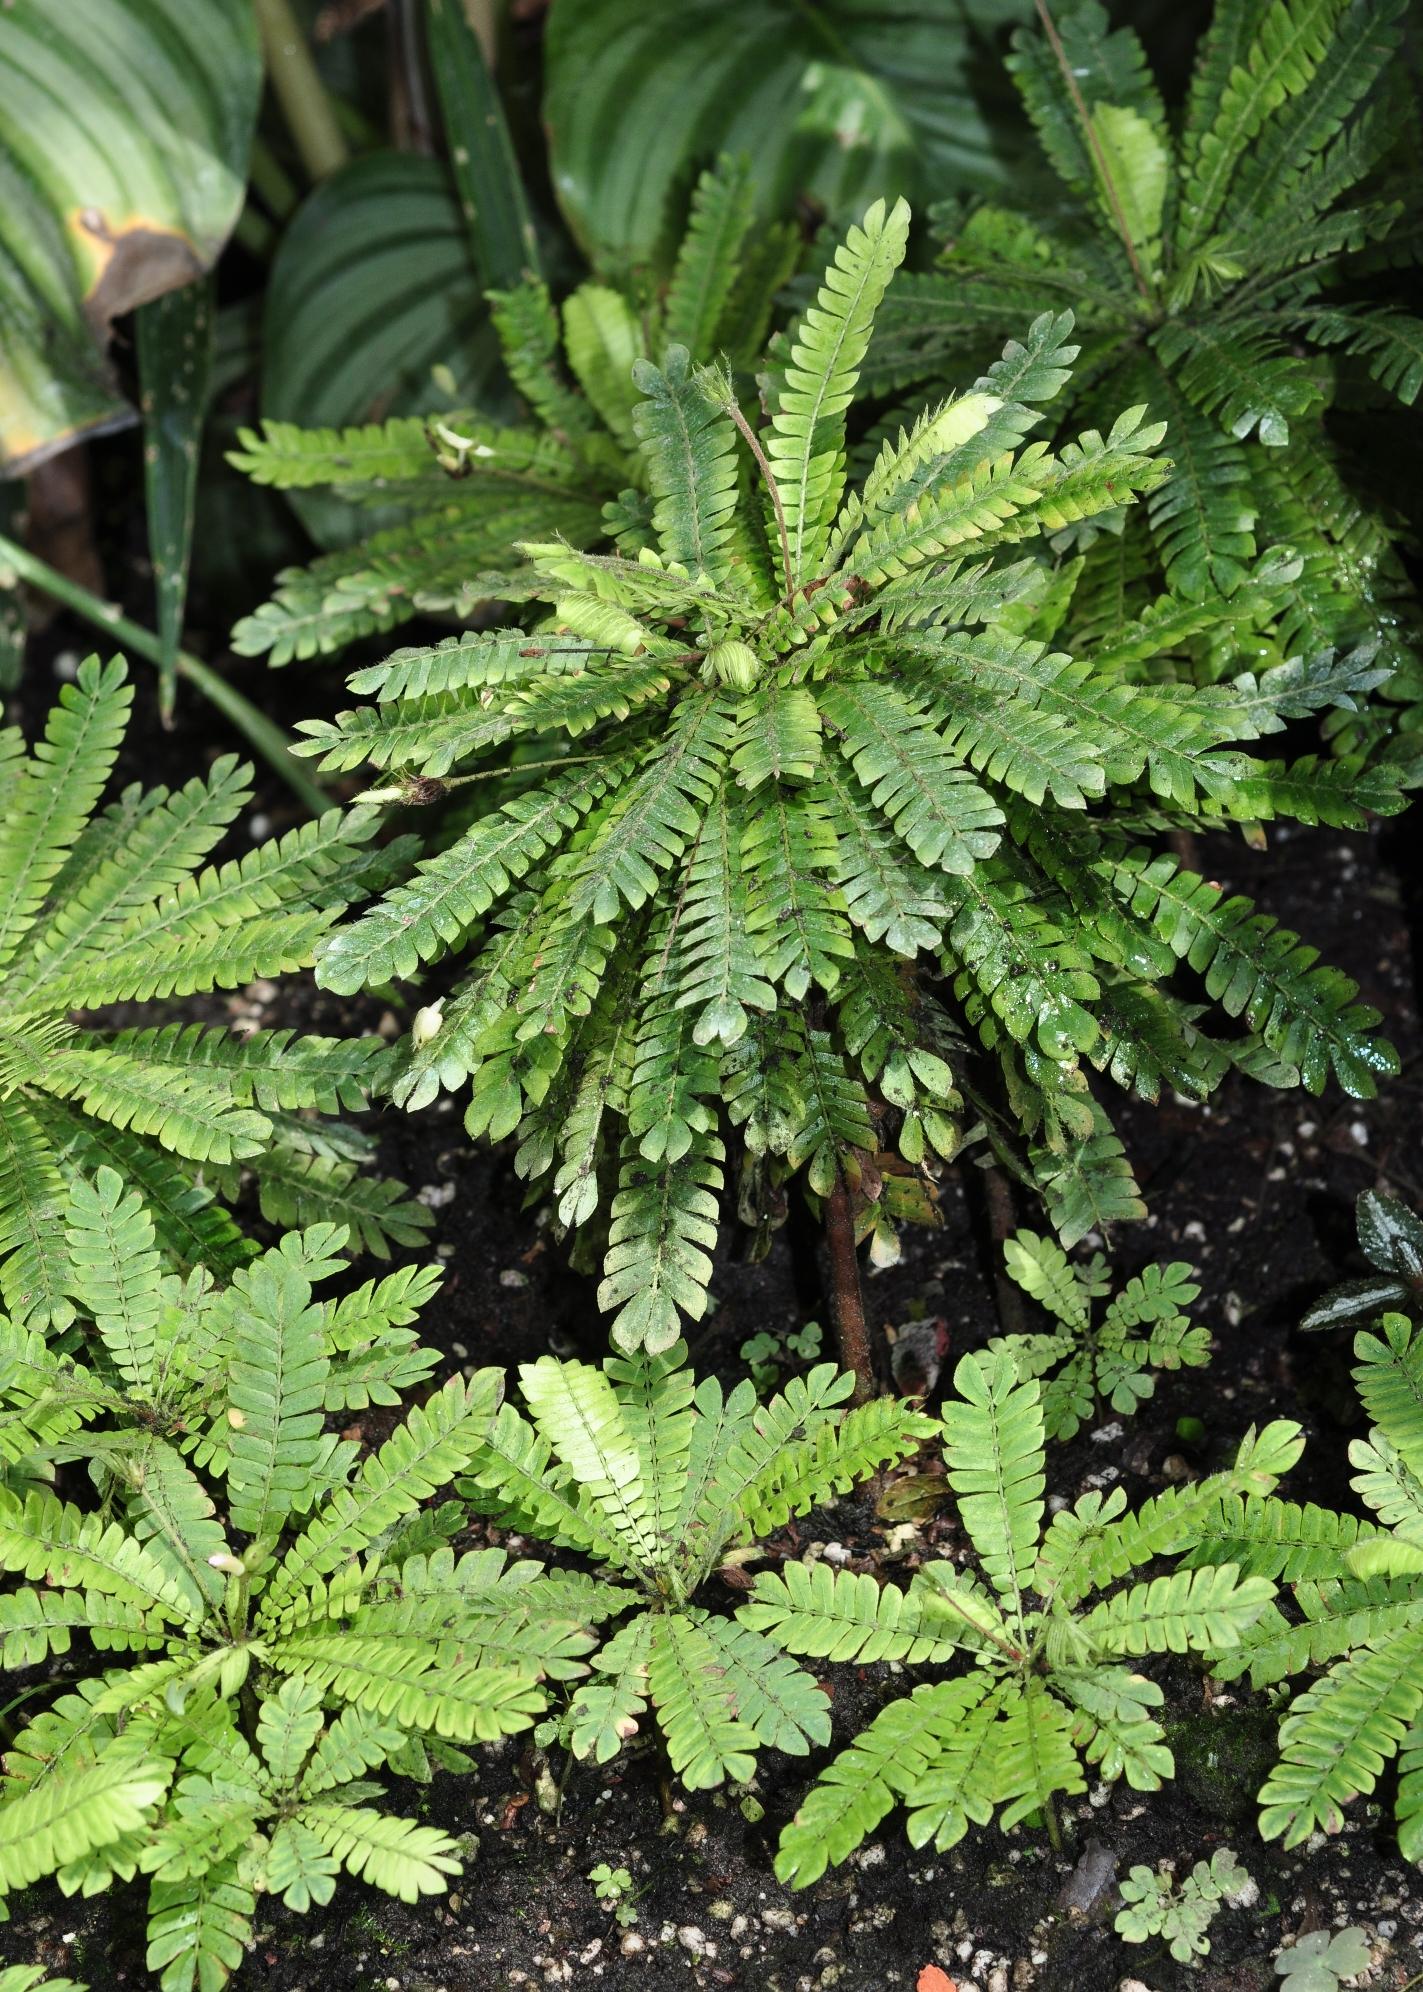 Biophytum dendroides (Oxalidaceae) image 38348 at